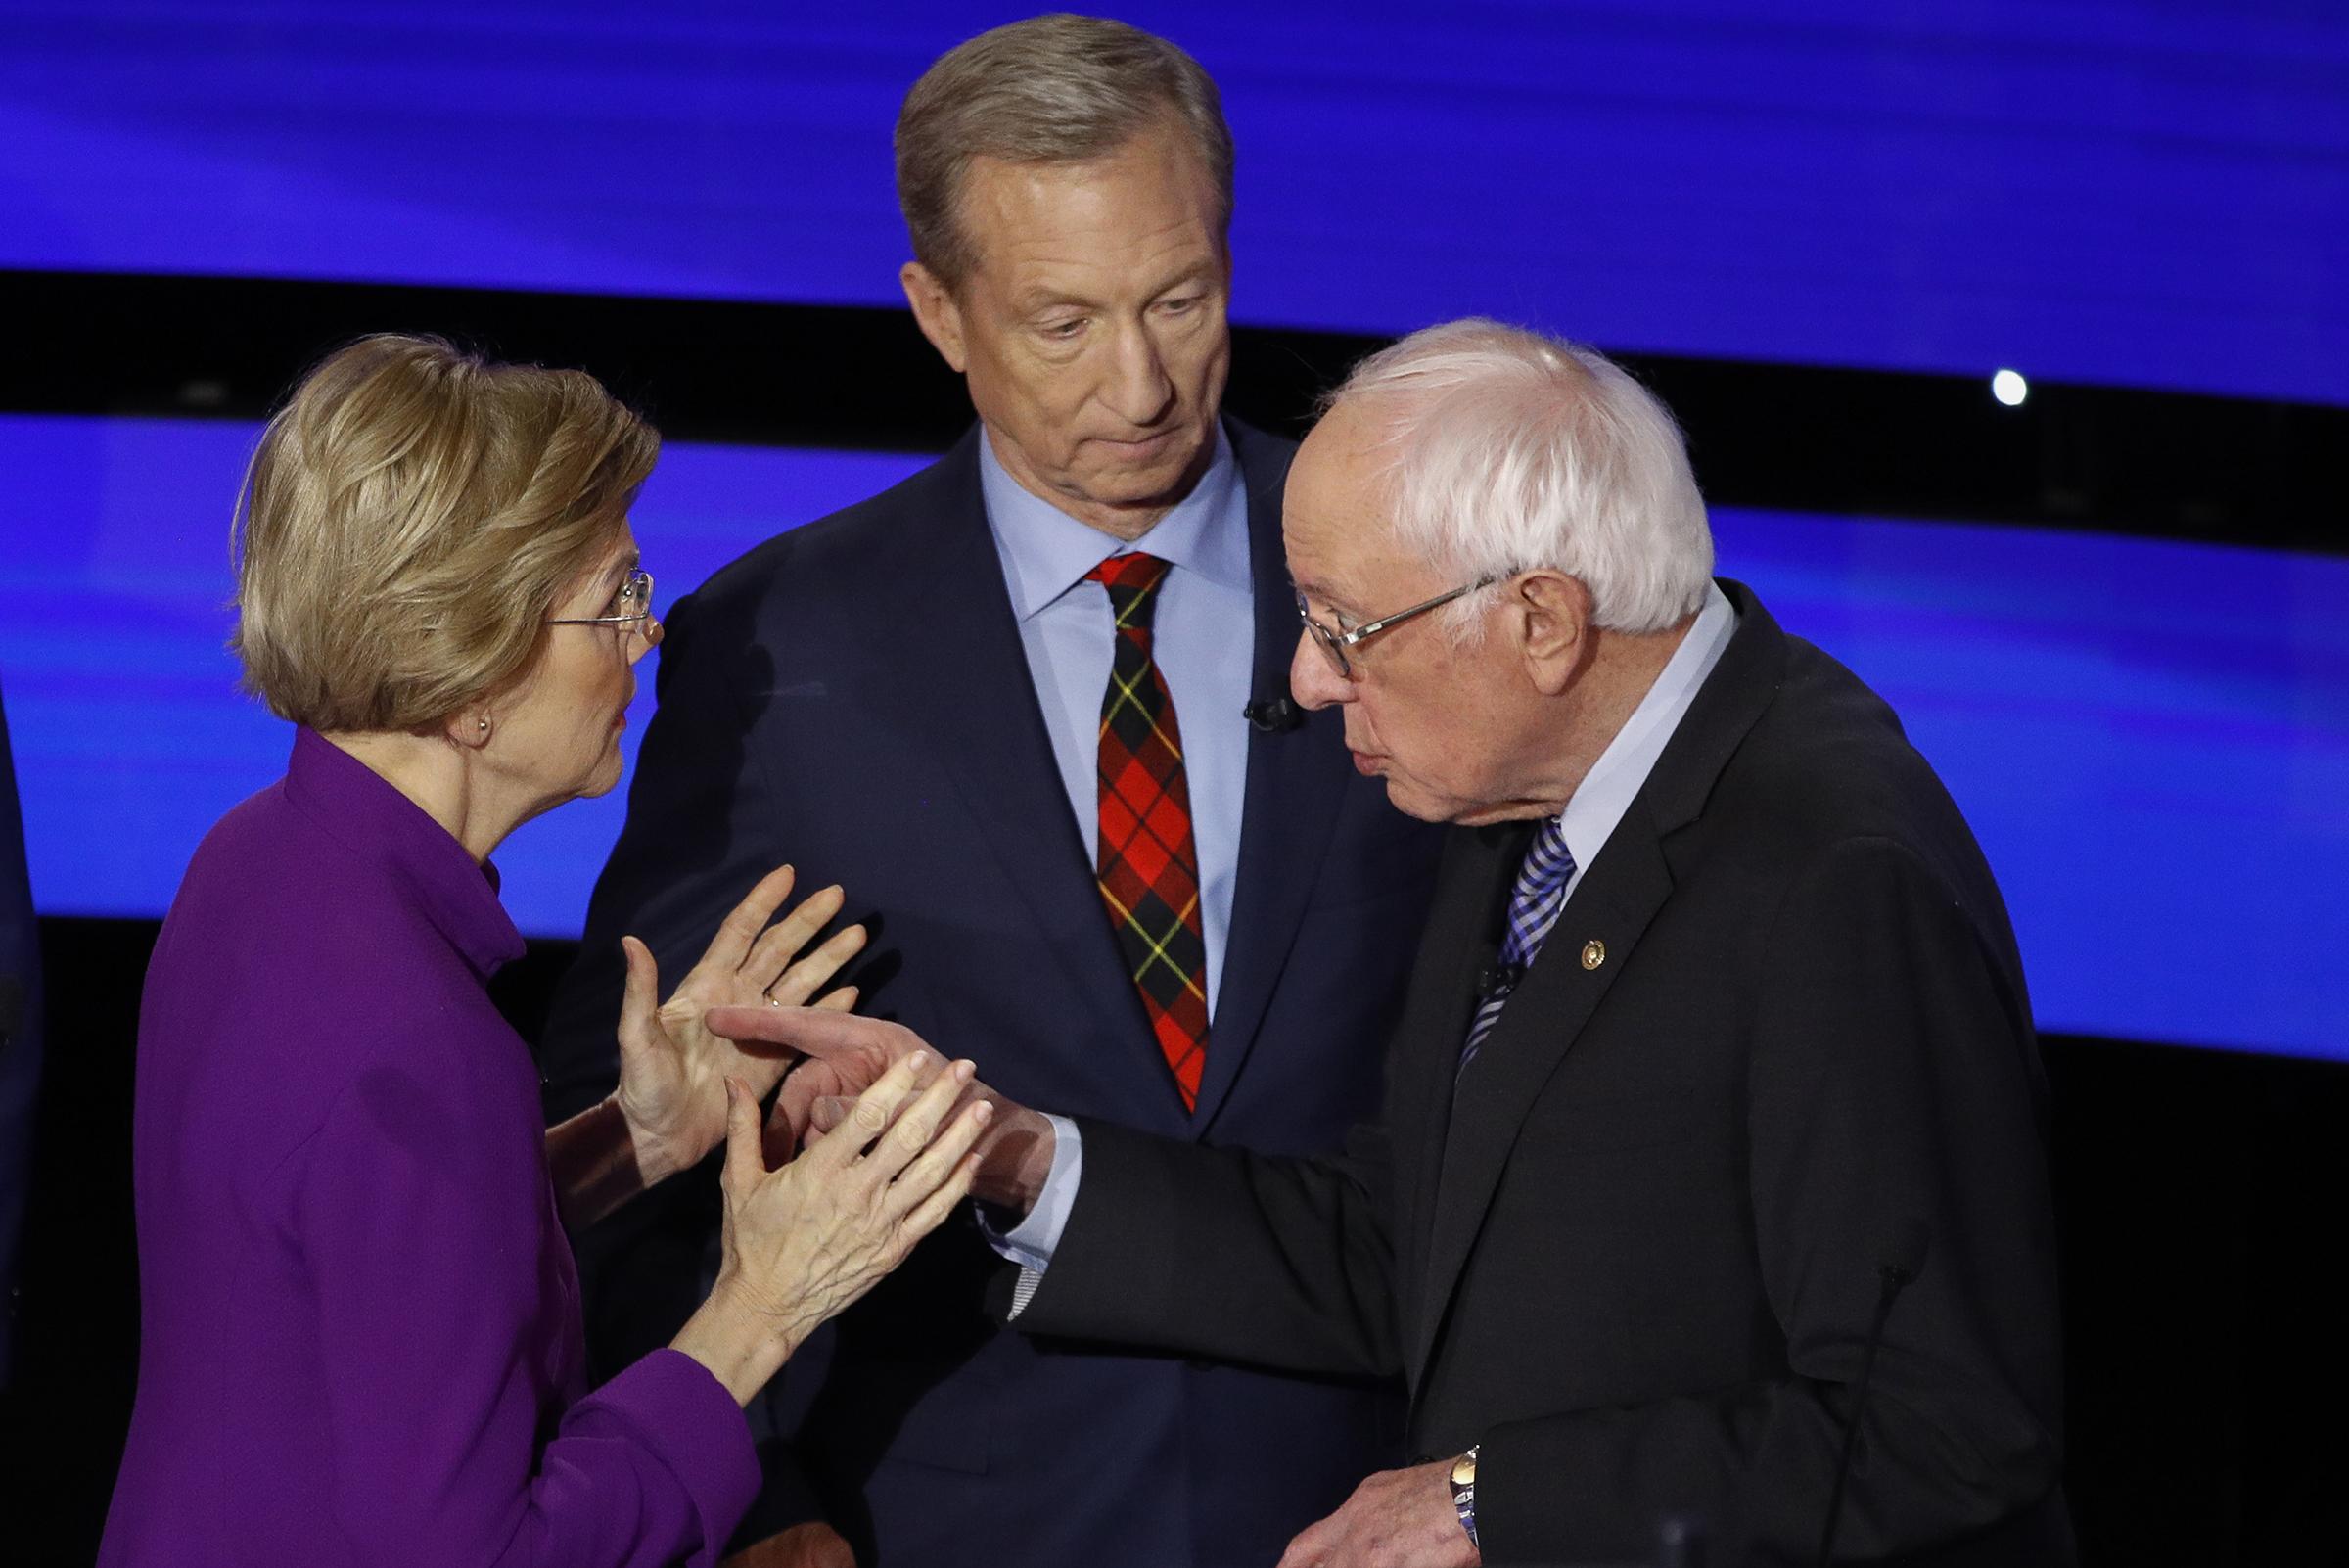 Democratic presidential candidate Sen. Elizabeth Warren, D-Mass., left and Sen. Bernie Sanders, I-Vt., talk after a Democratic presidential primary debate in Des Moines, Iowa., as businessman Tom Steyer looks on, on Jan. 14, 2020.